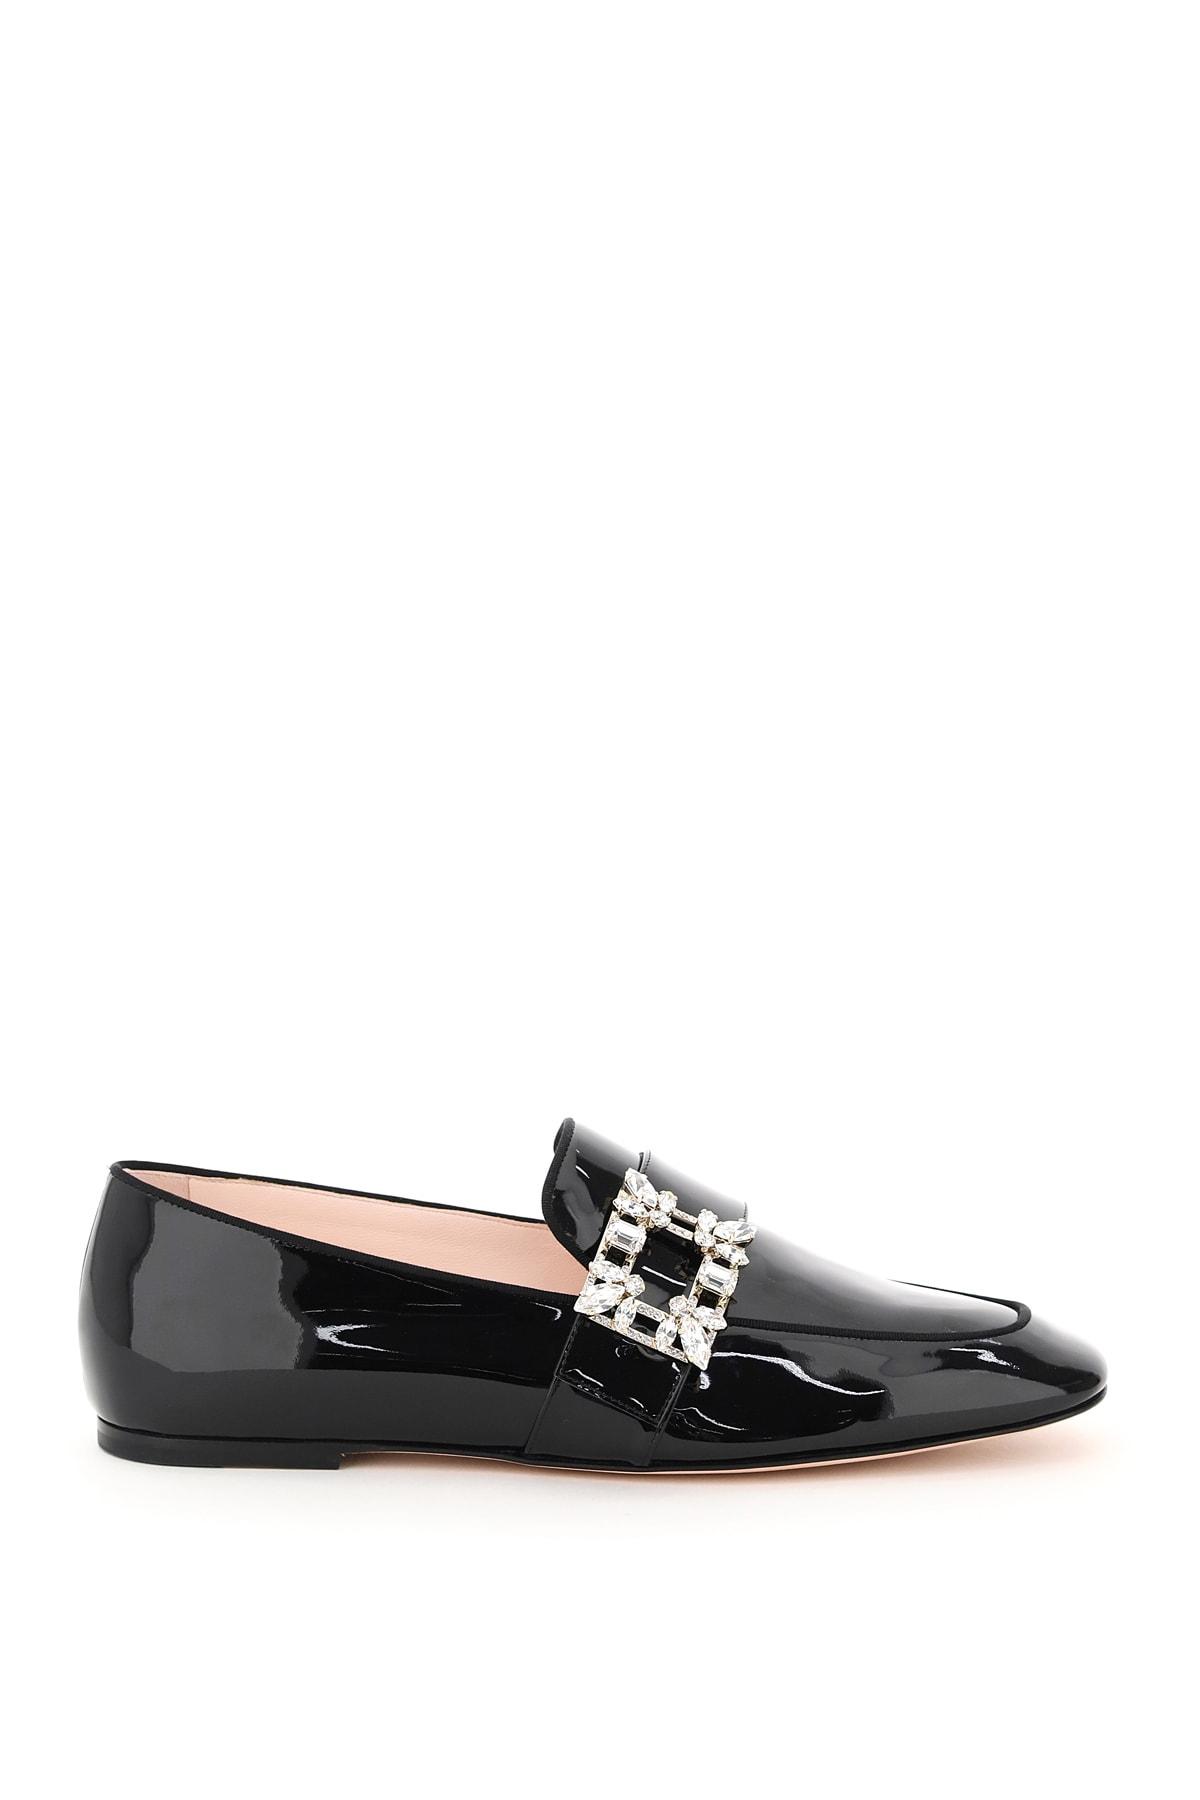 Roger Vivier Mini Broche Loafers